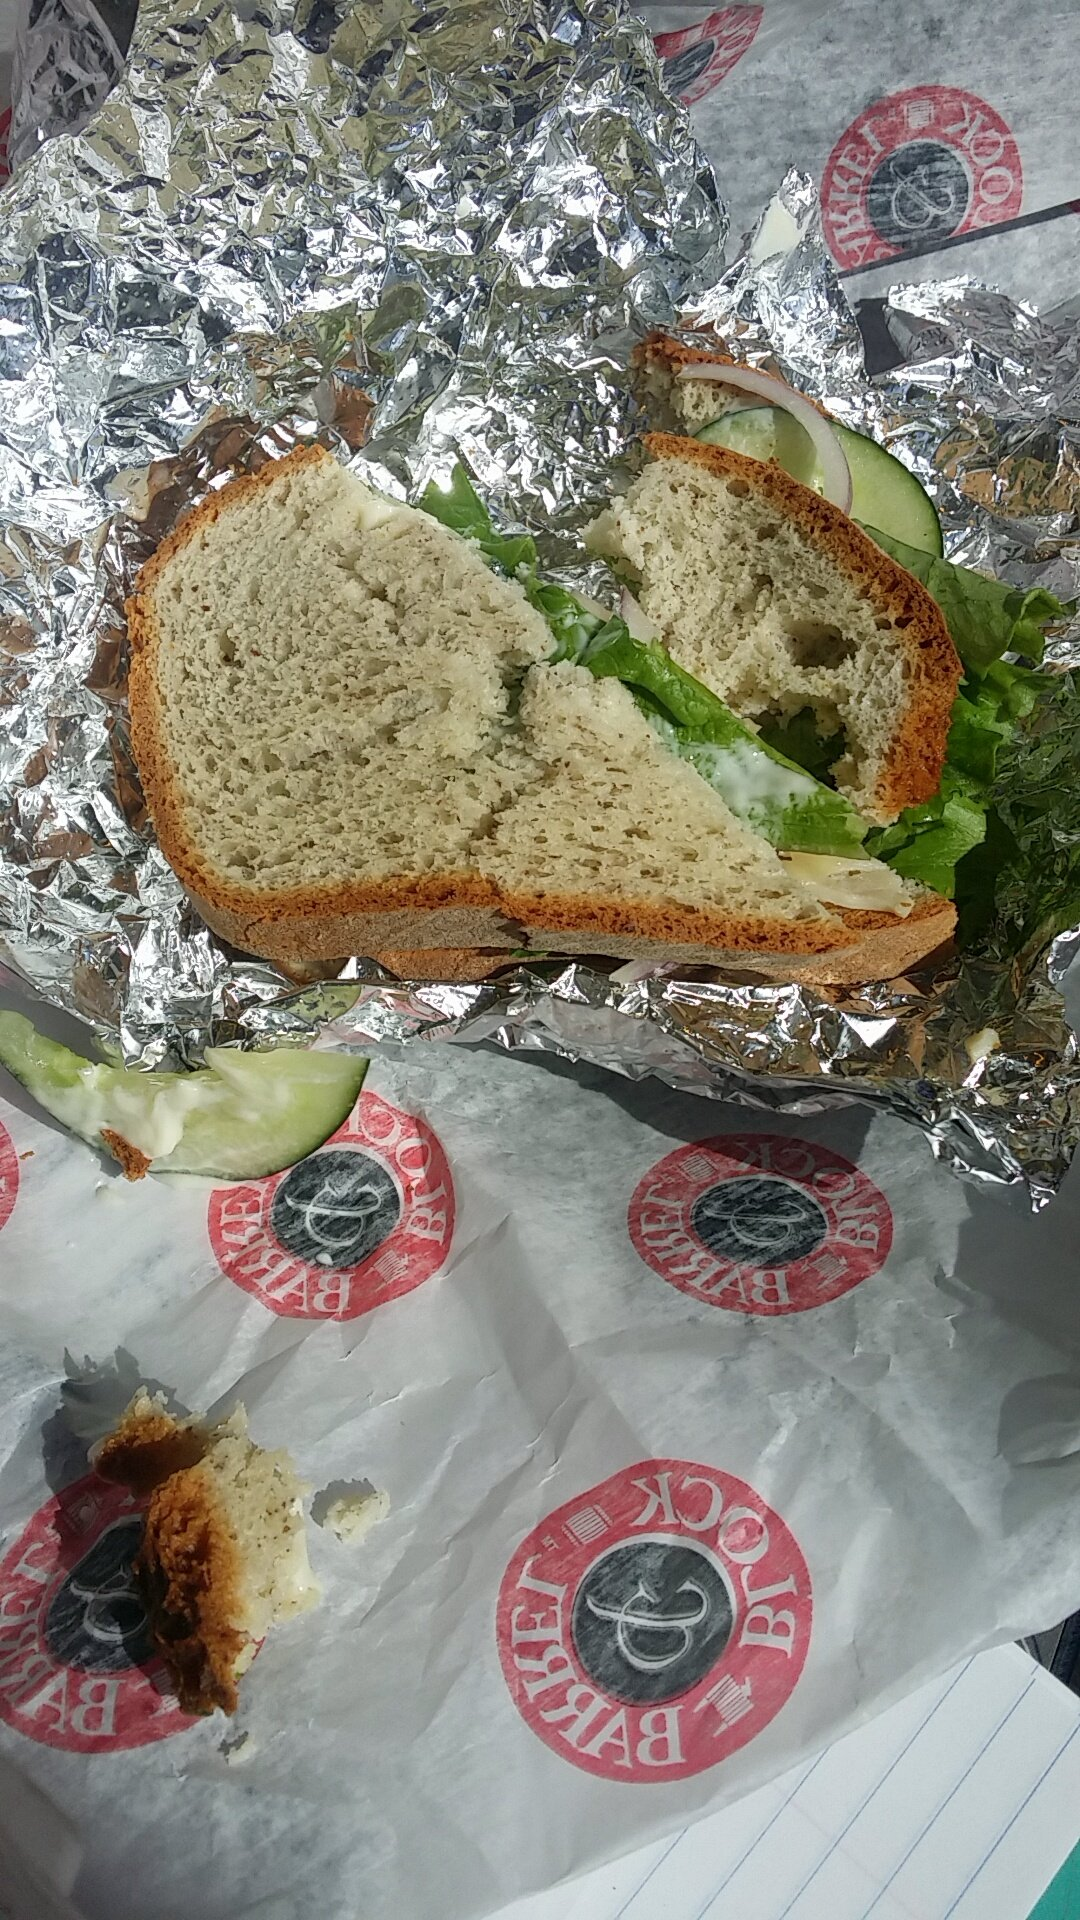 Gluten-free sandwich from Montague's Deli in Market One